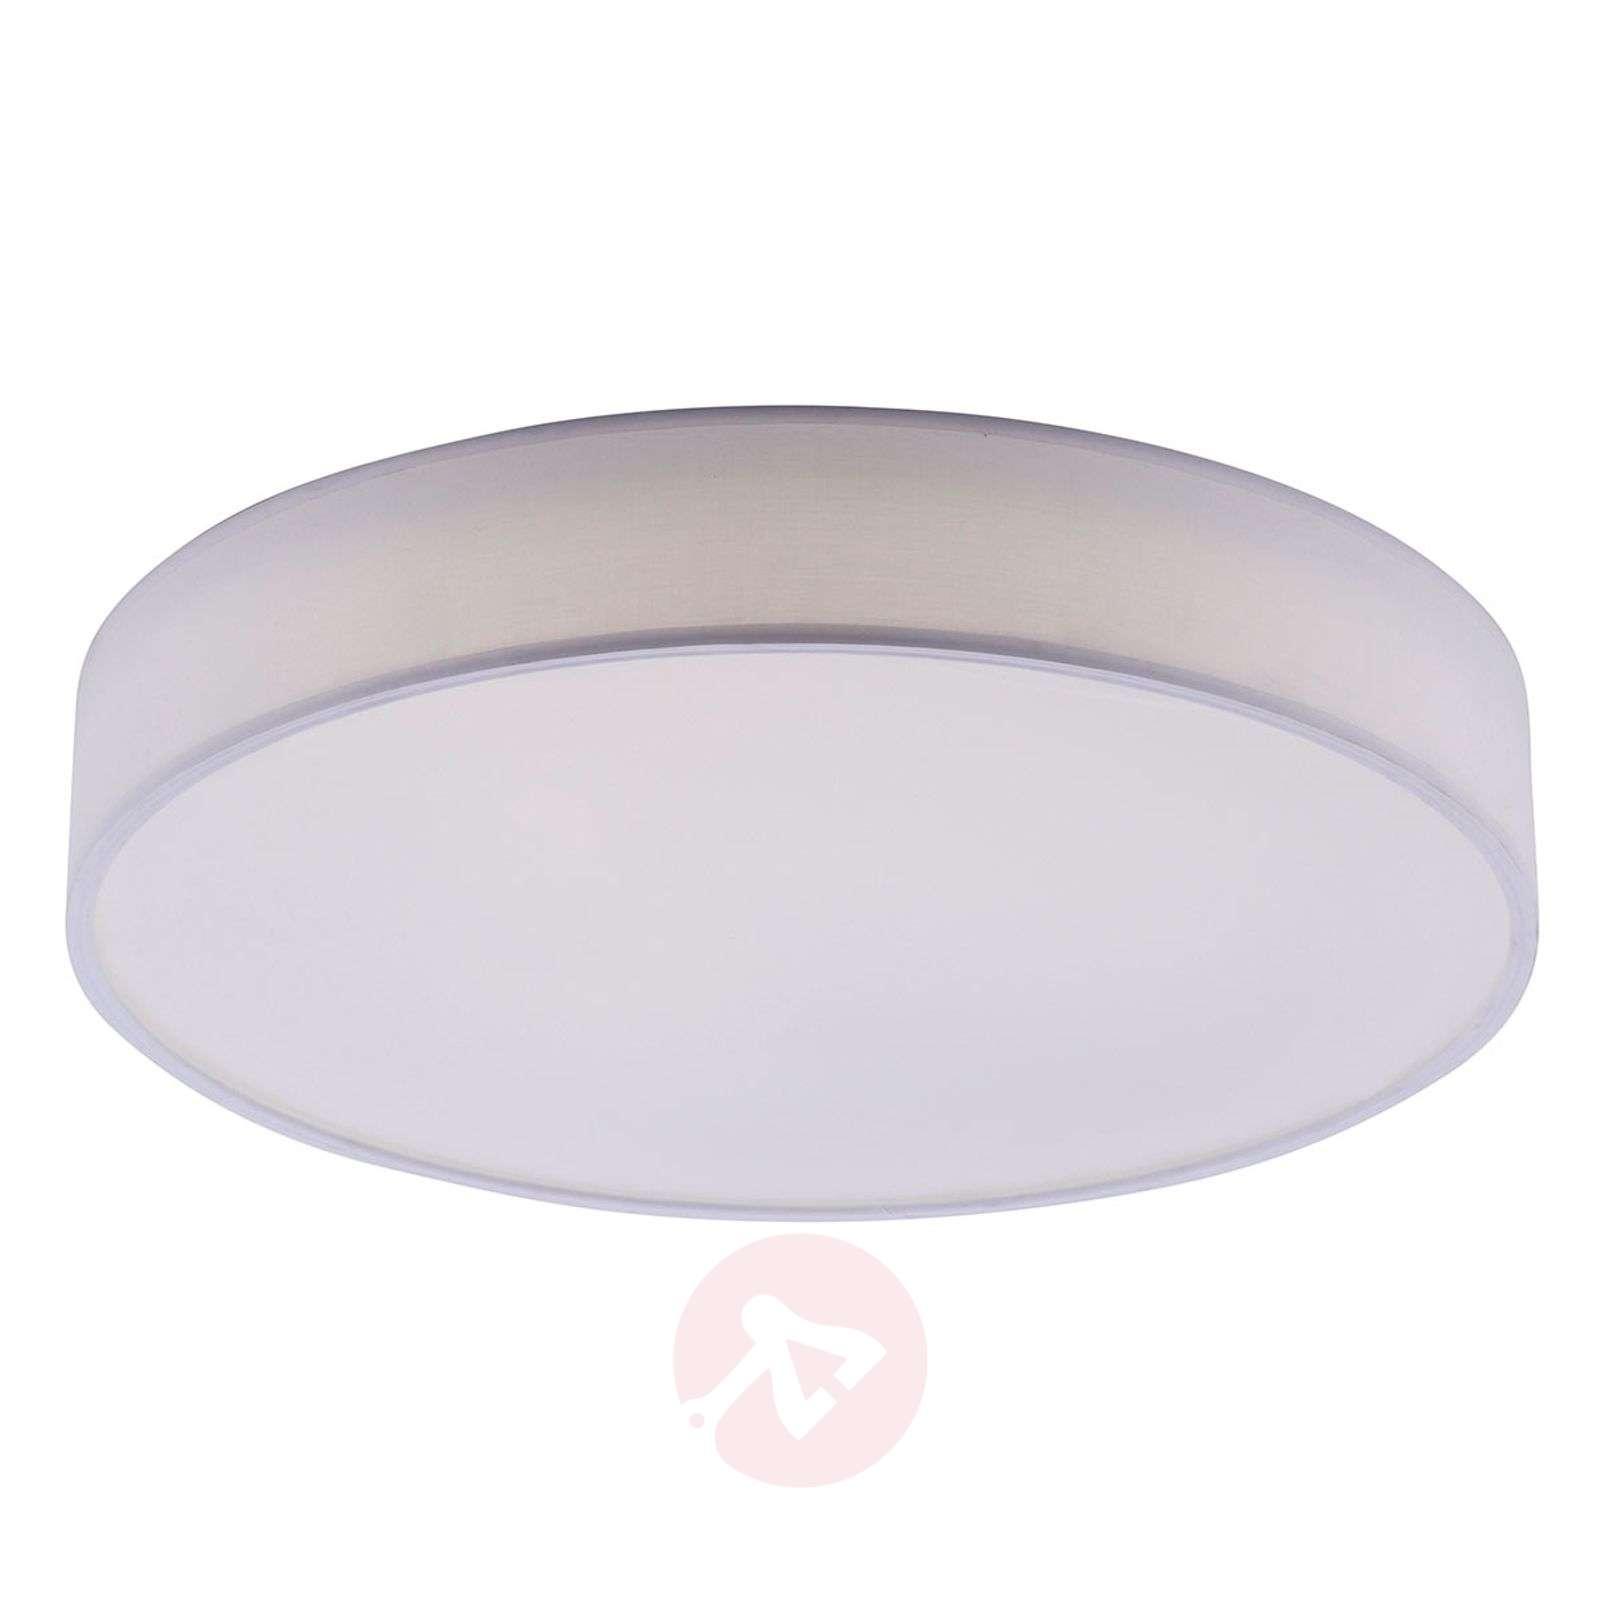 LED-RGB, kangas kattovalaisin Ajai 3000-5000K WiZ-8032178X-01